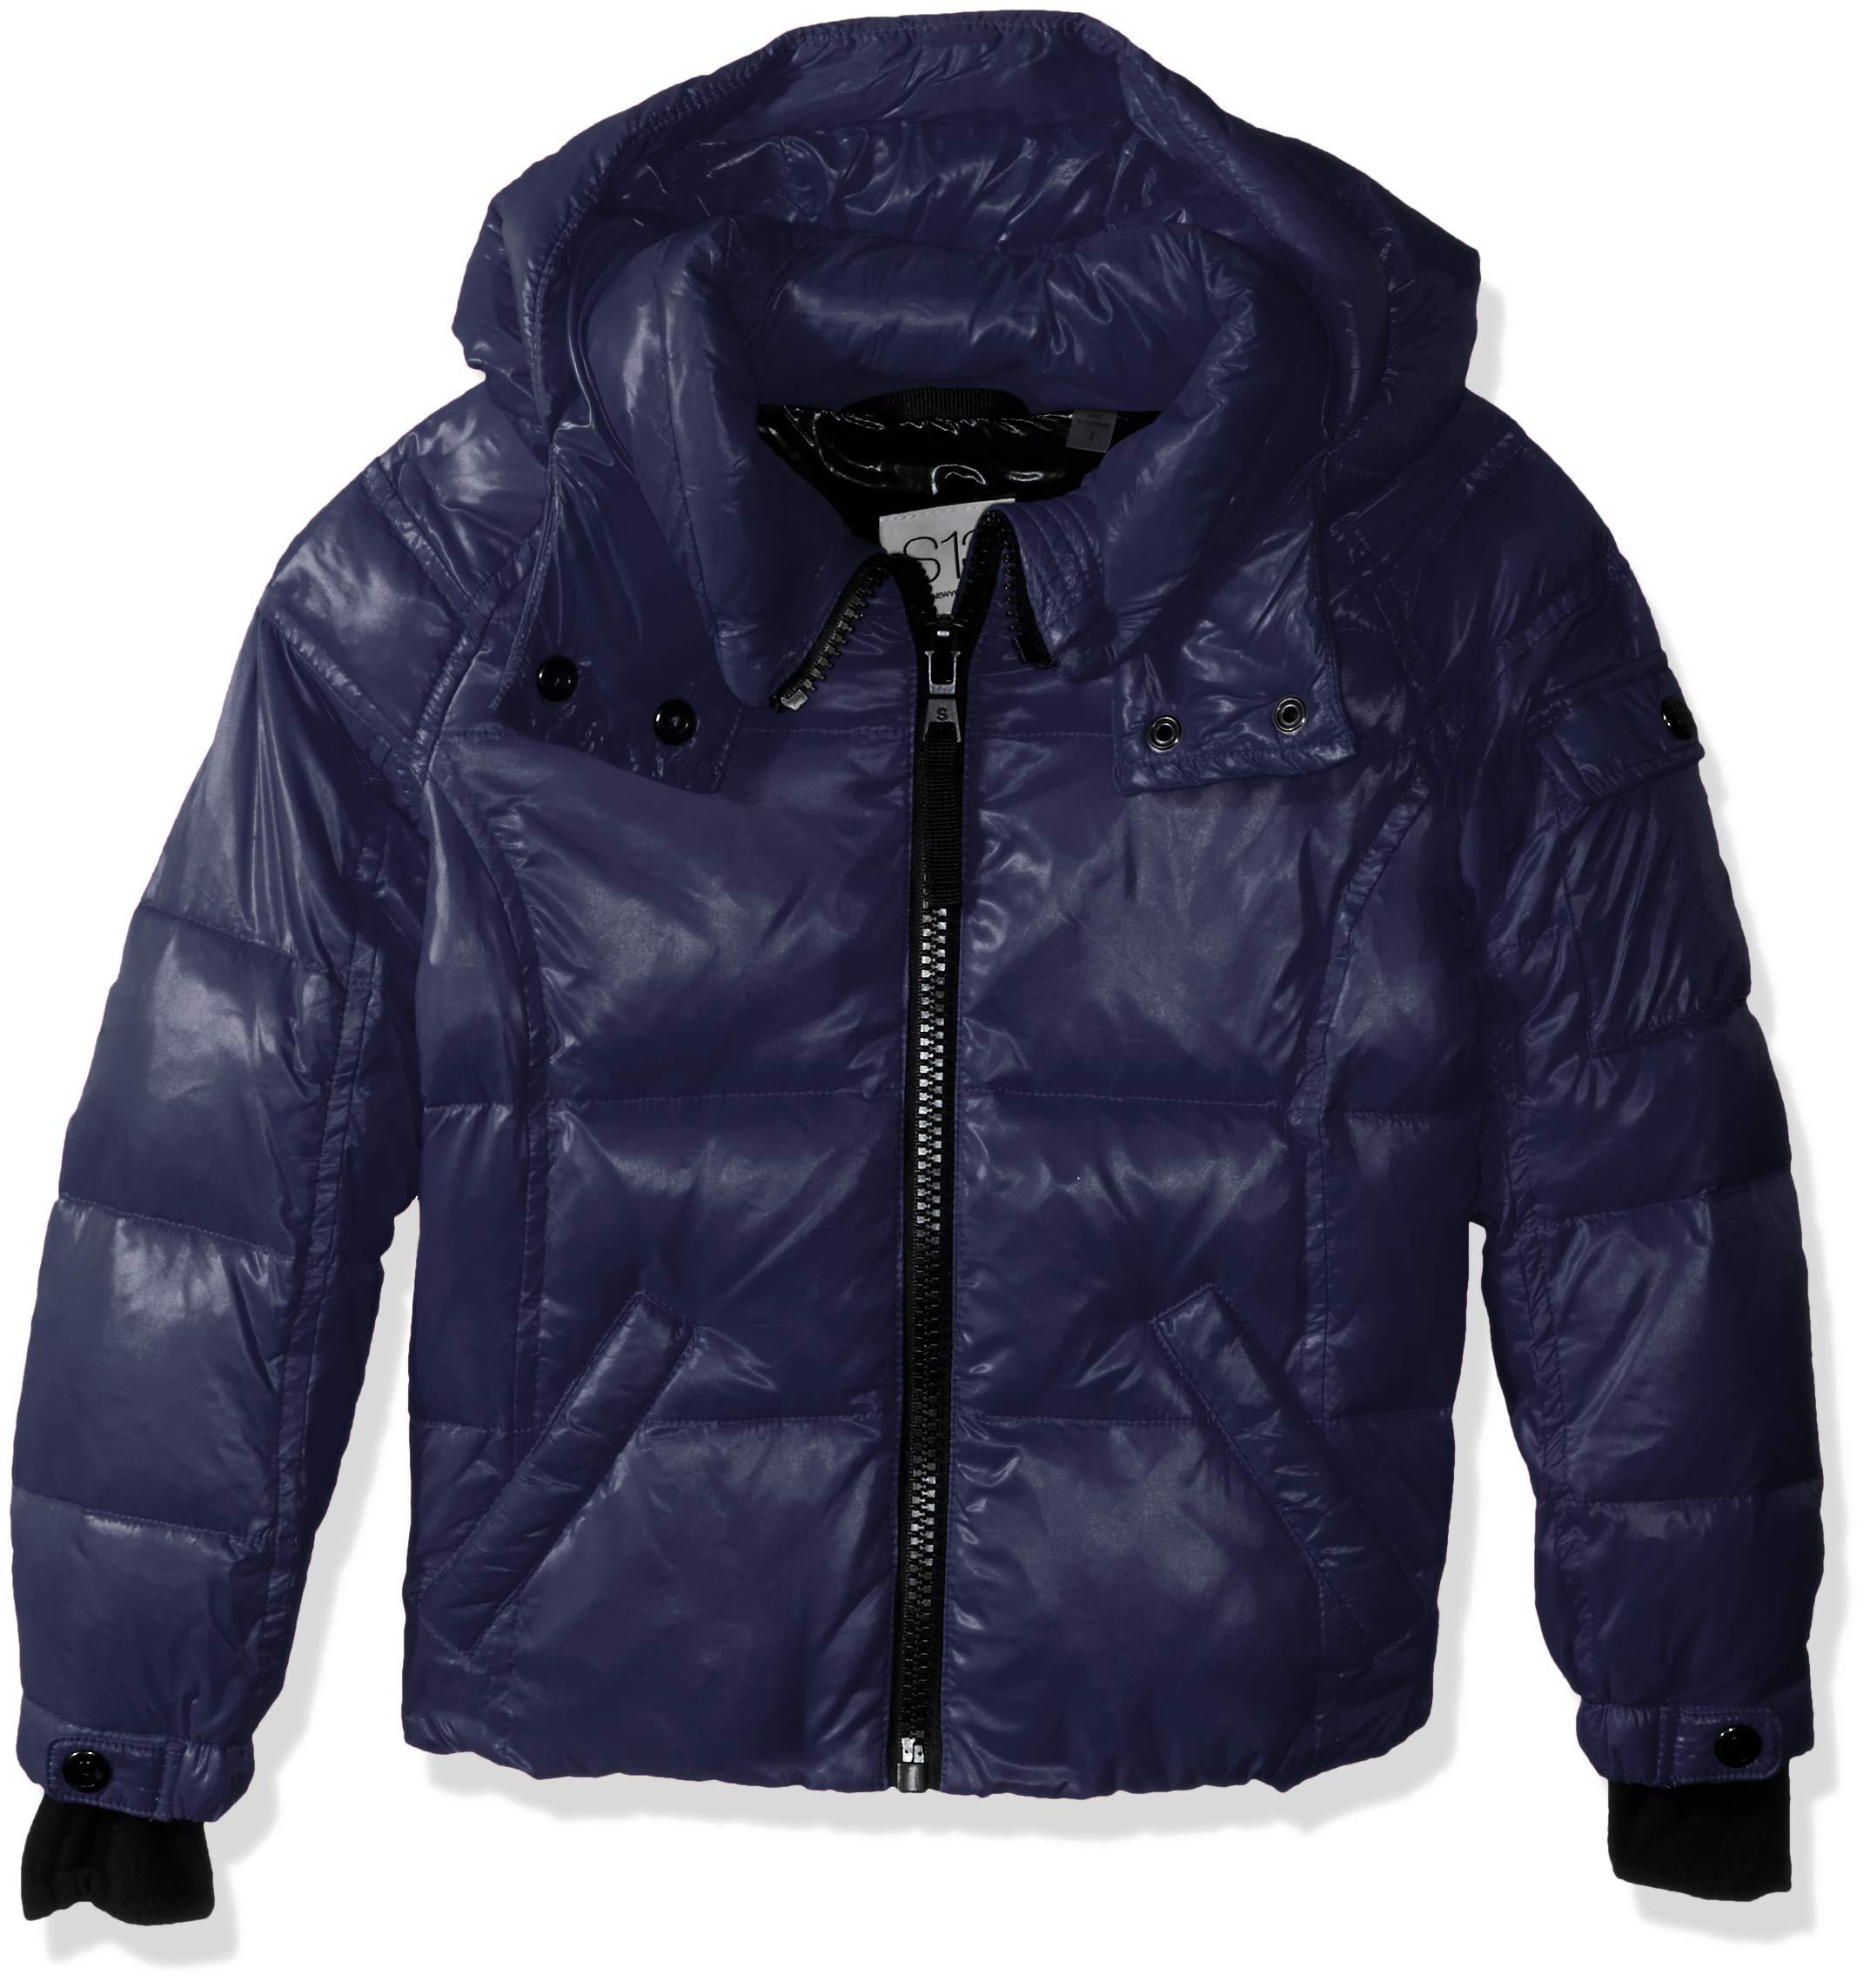 S13 Girls' Little Mogul Gloss Down Puffer with Detachable Hood, Navy 2